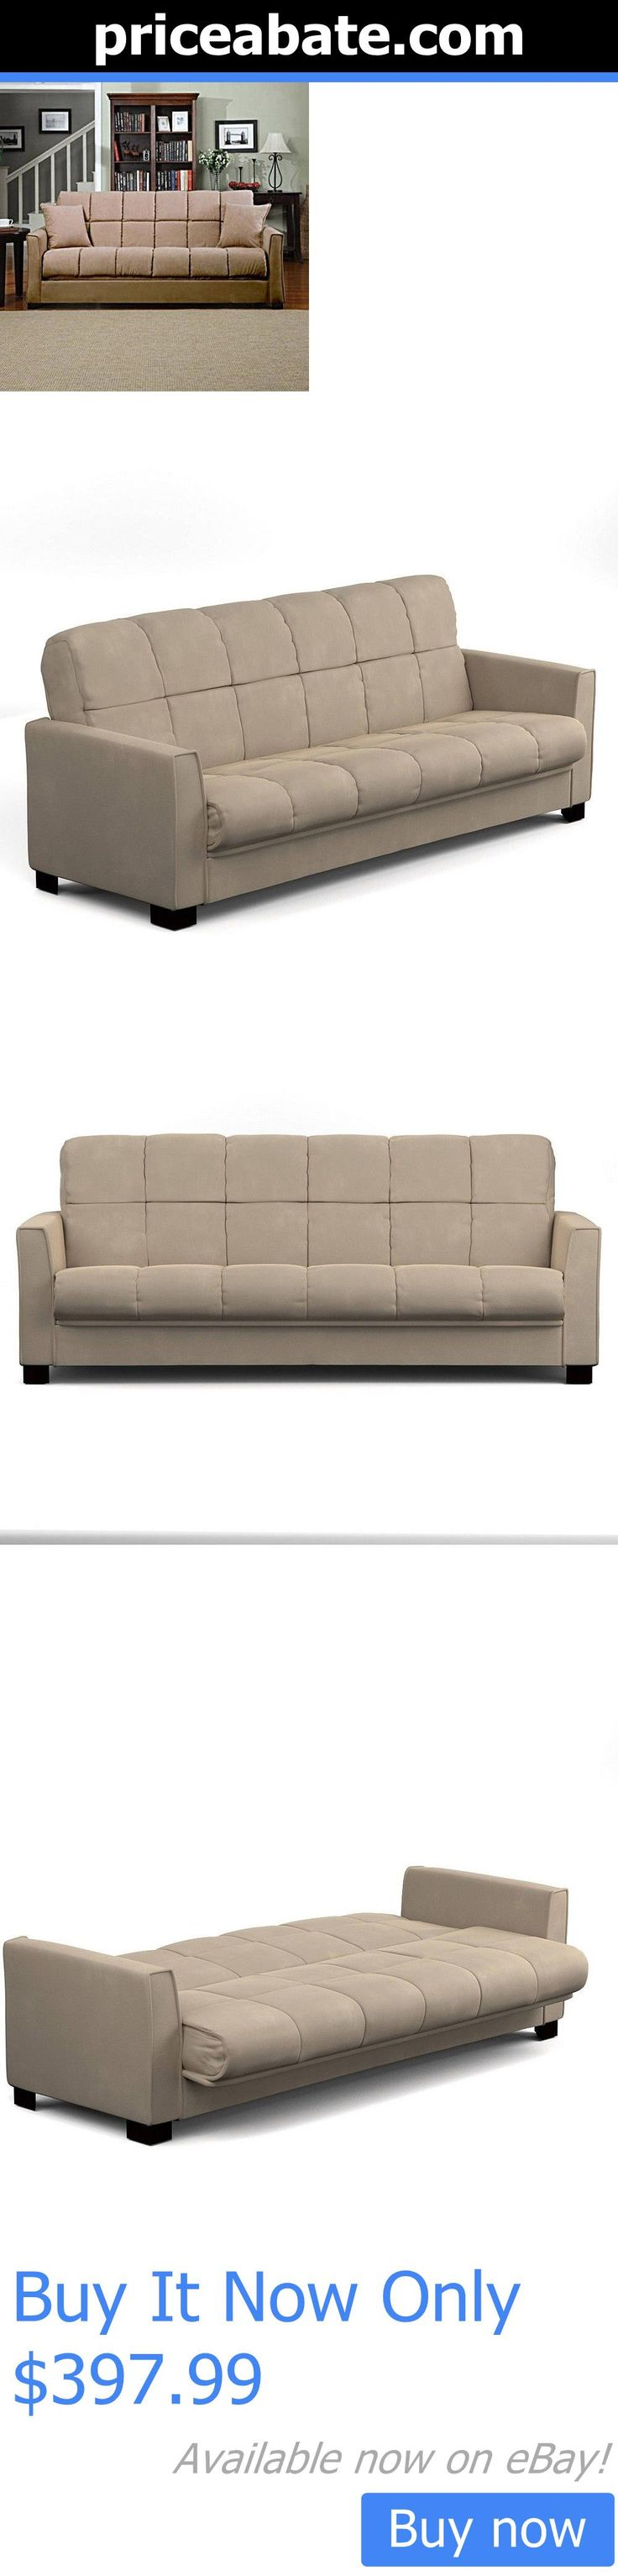 Die besten 20 Small sectional sleeper sofa Ideen auf Pinterest